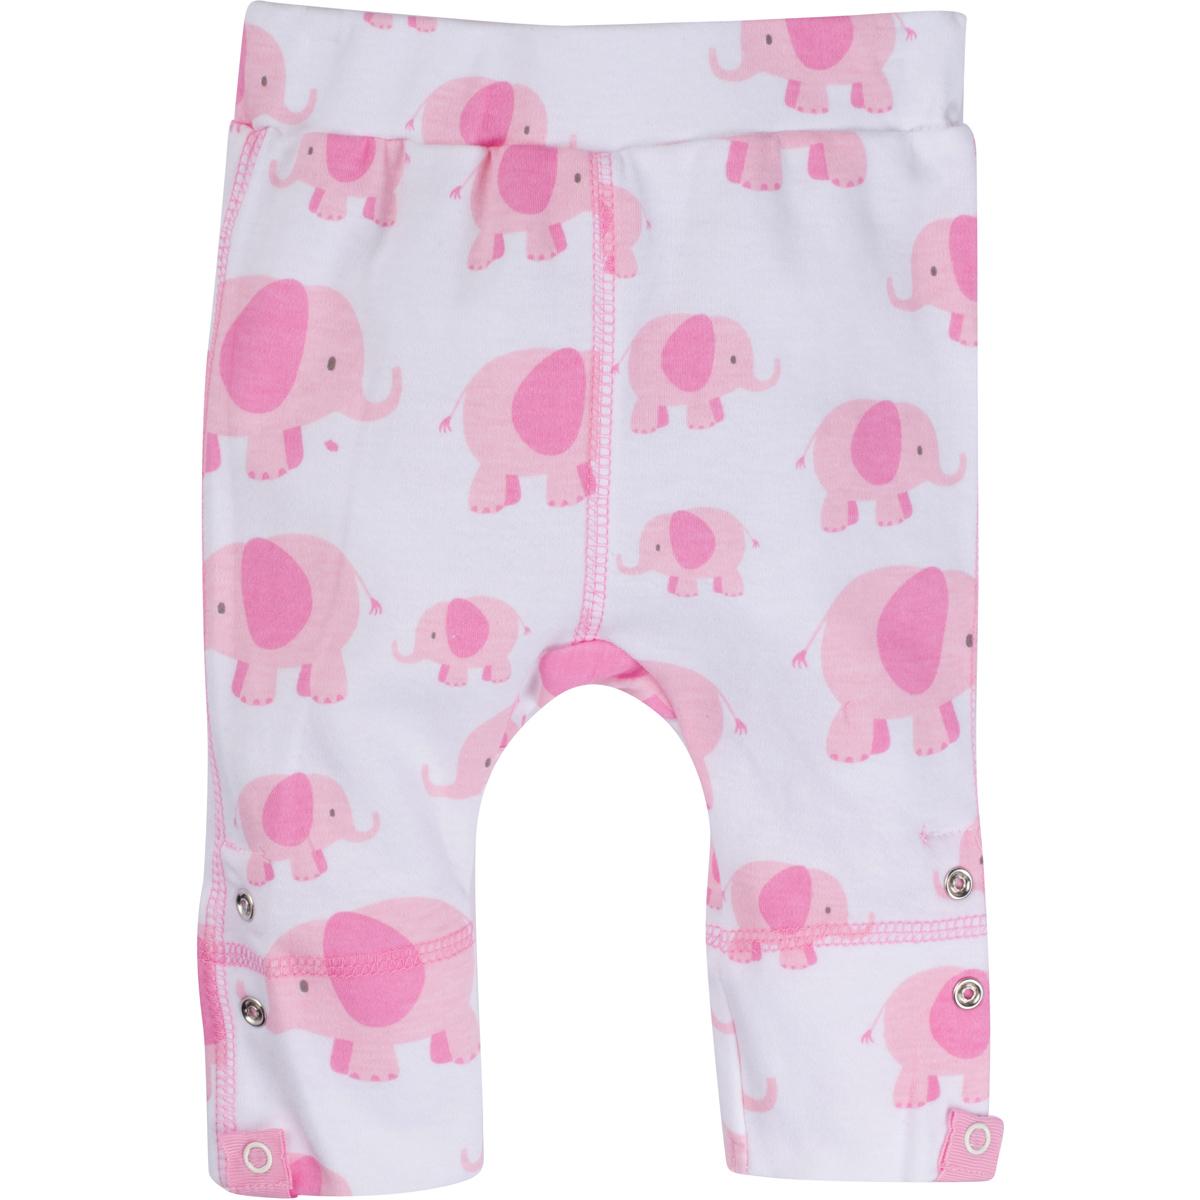 Pink Elephant Adjustable Pants